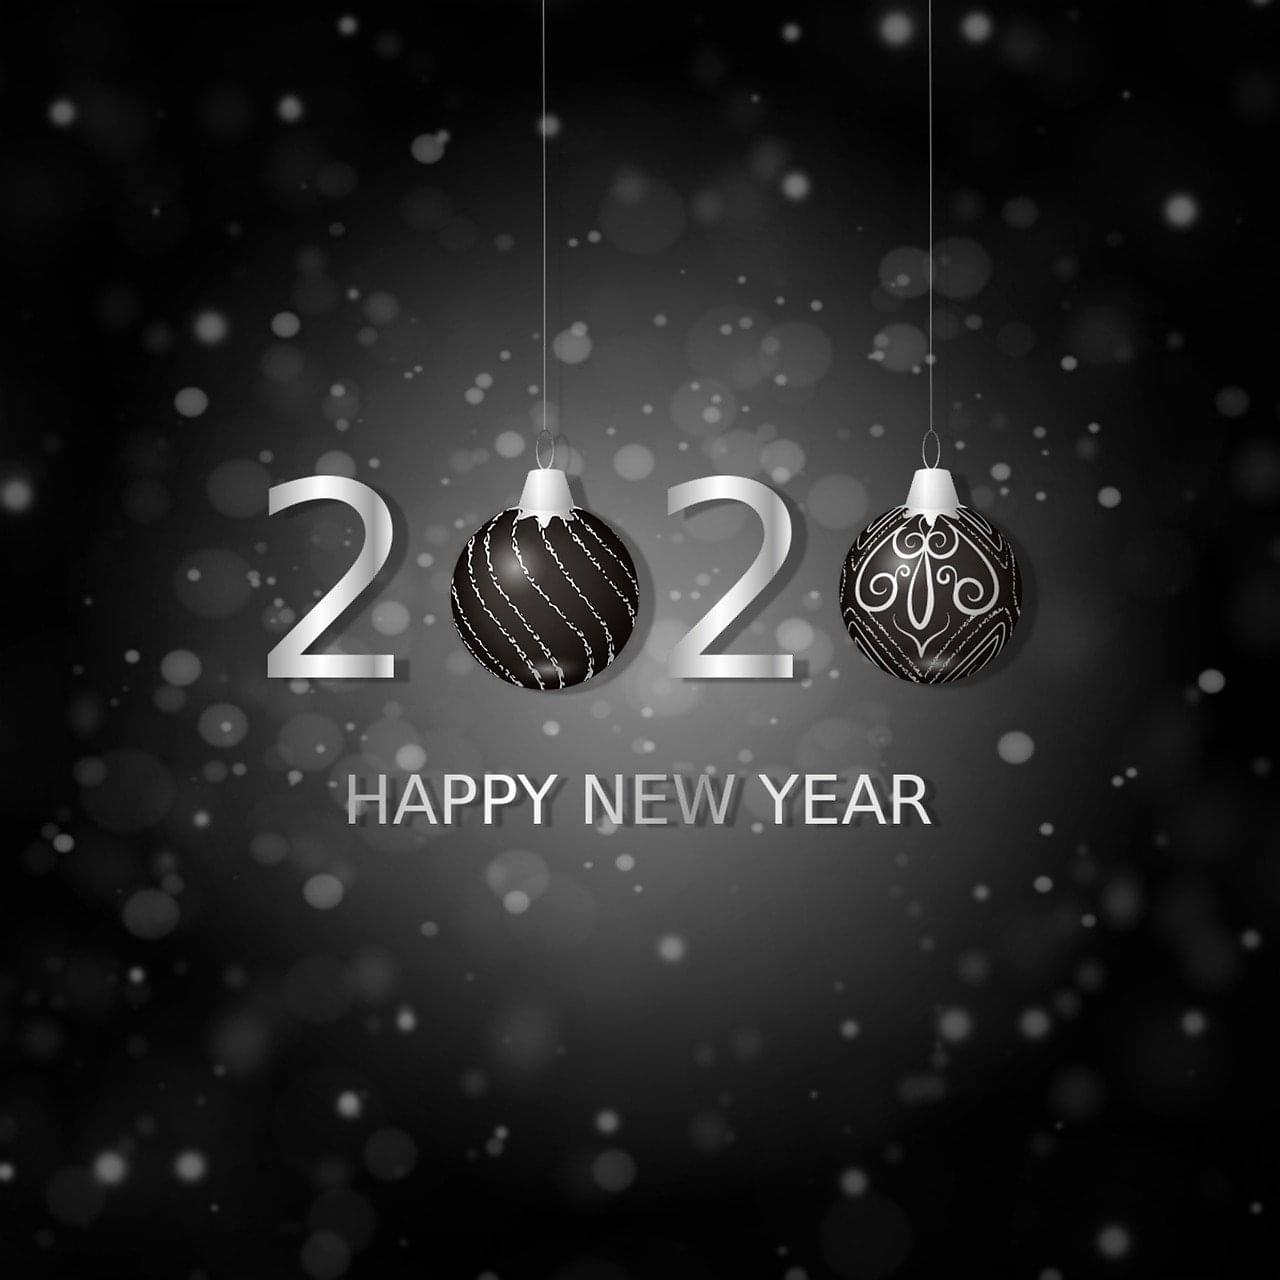 happy-new-year-4647004_1280